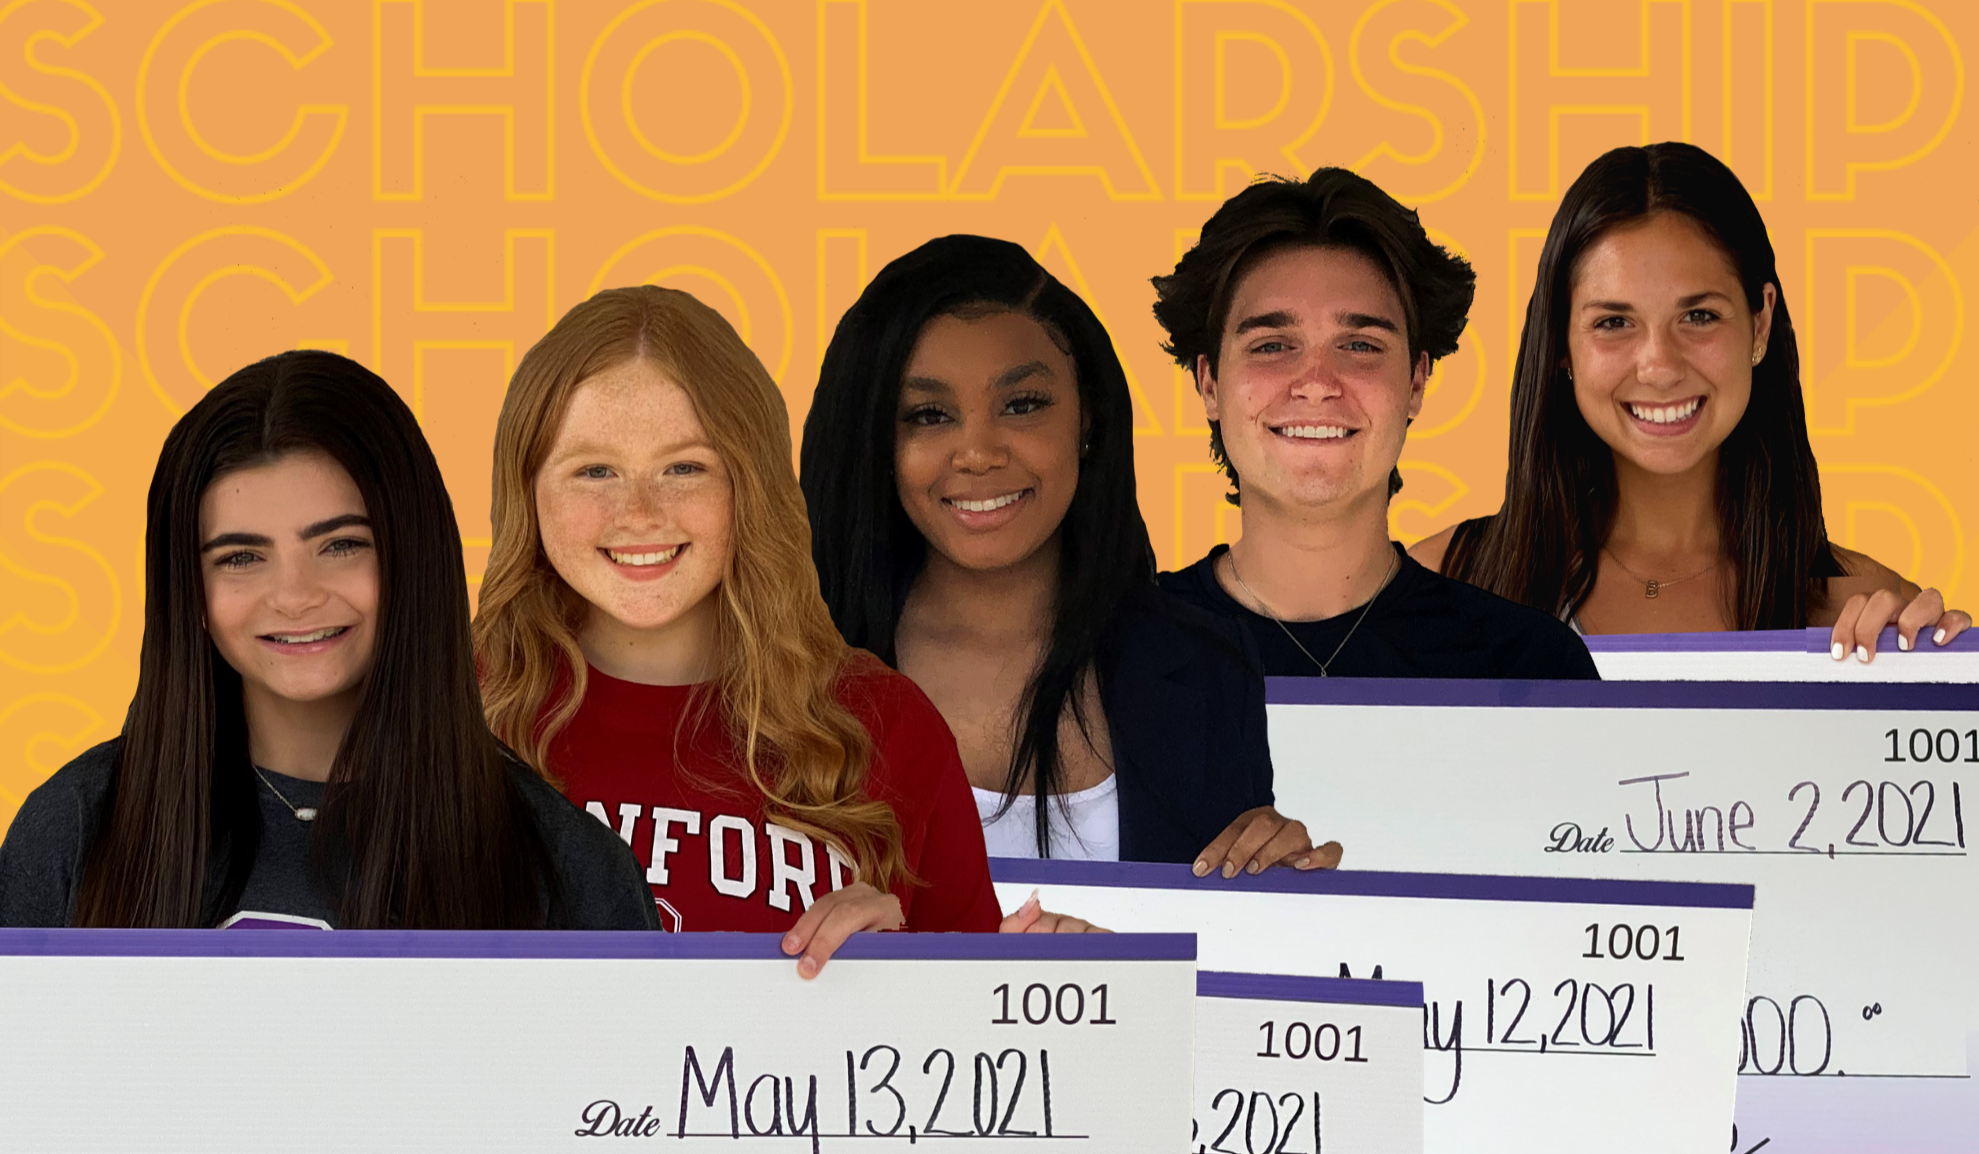 Louisiana FCU awards $10,000 scholarship to high school seniors